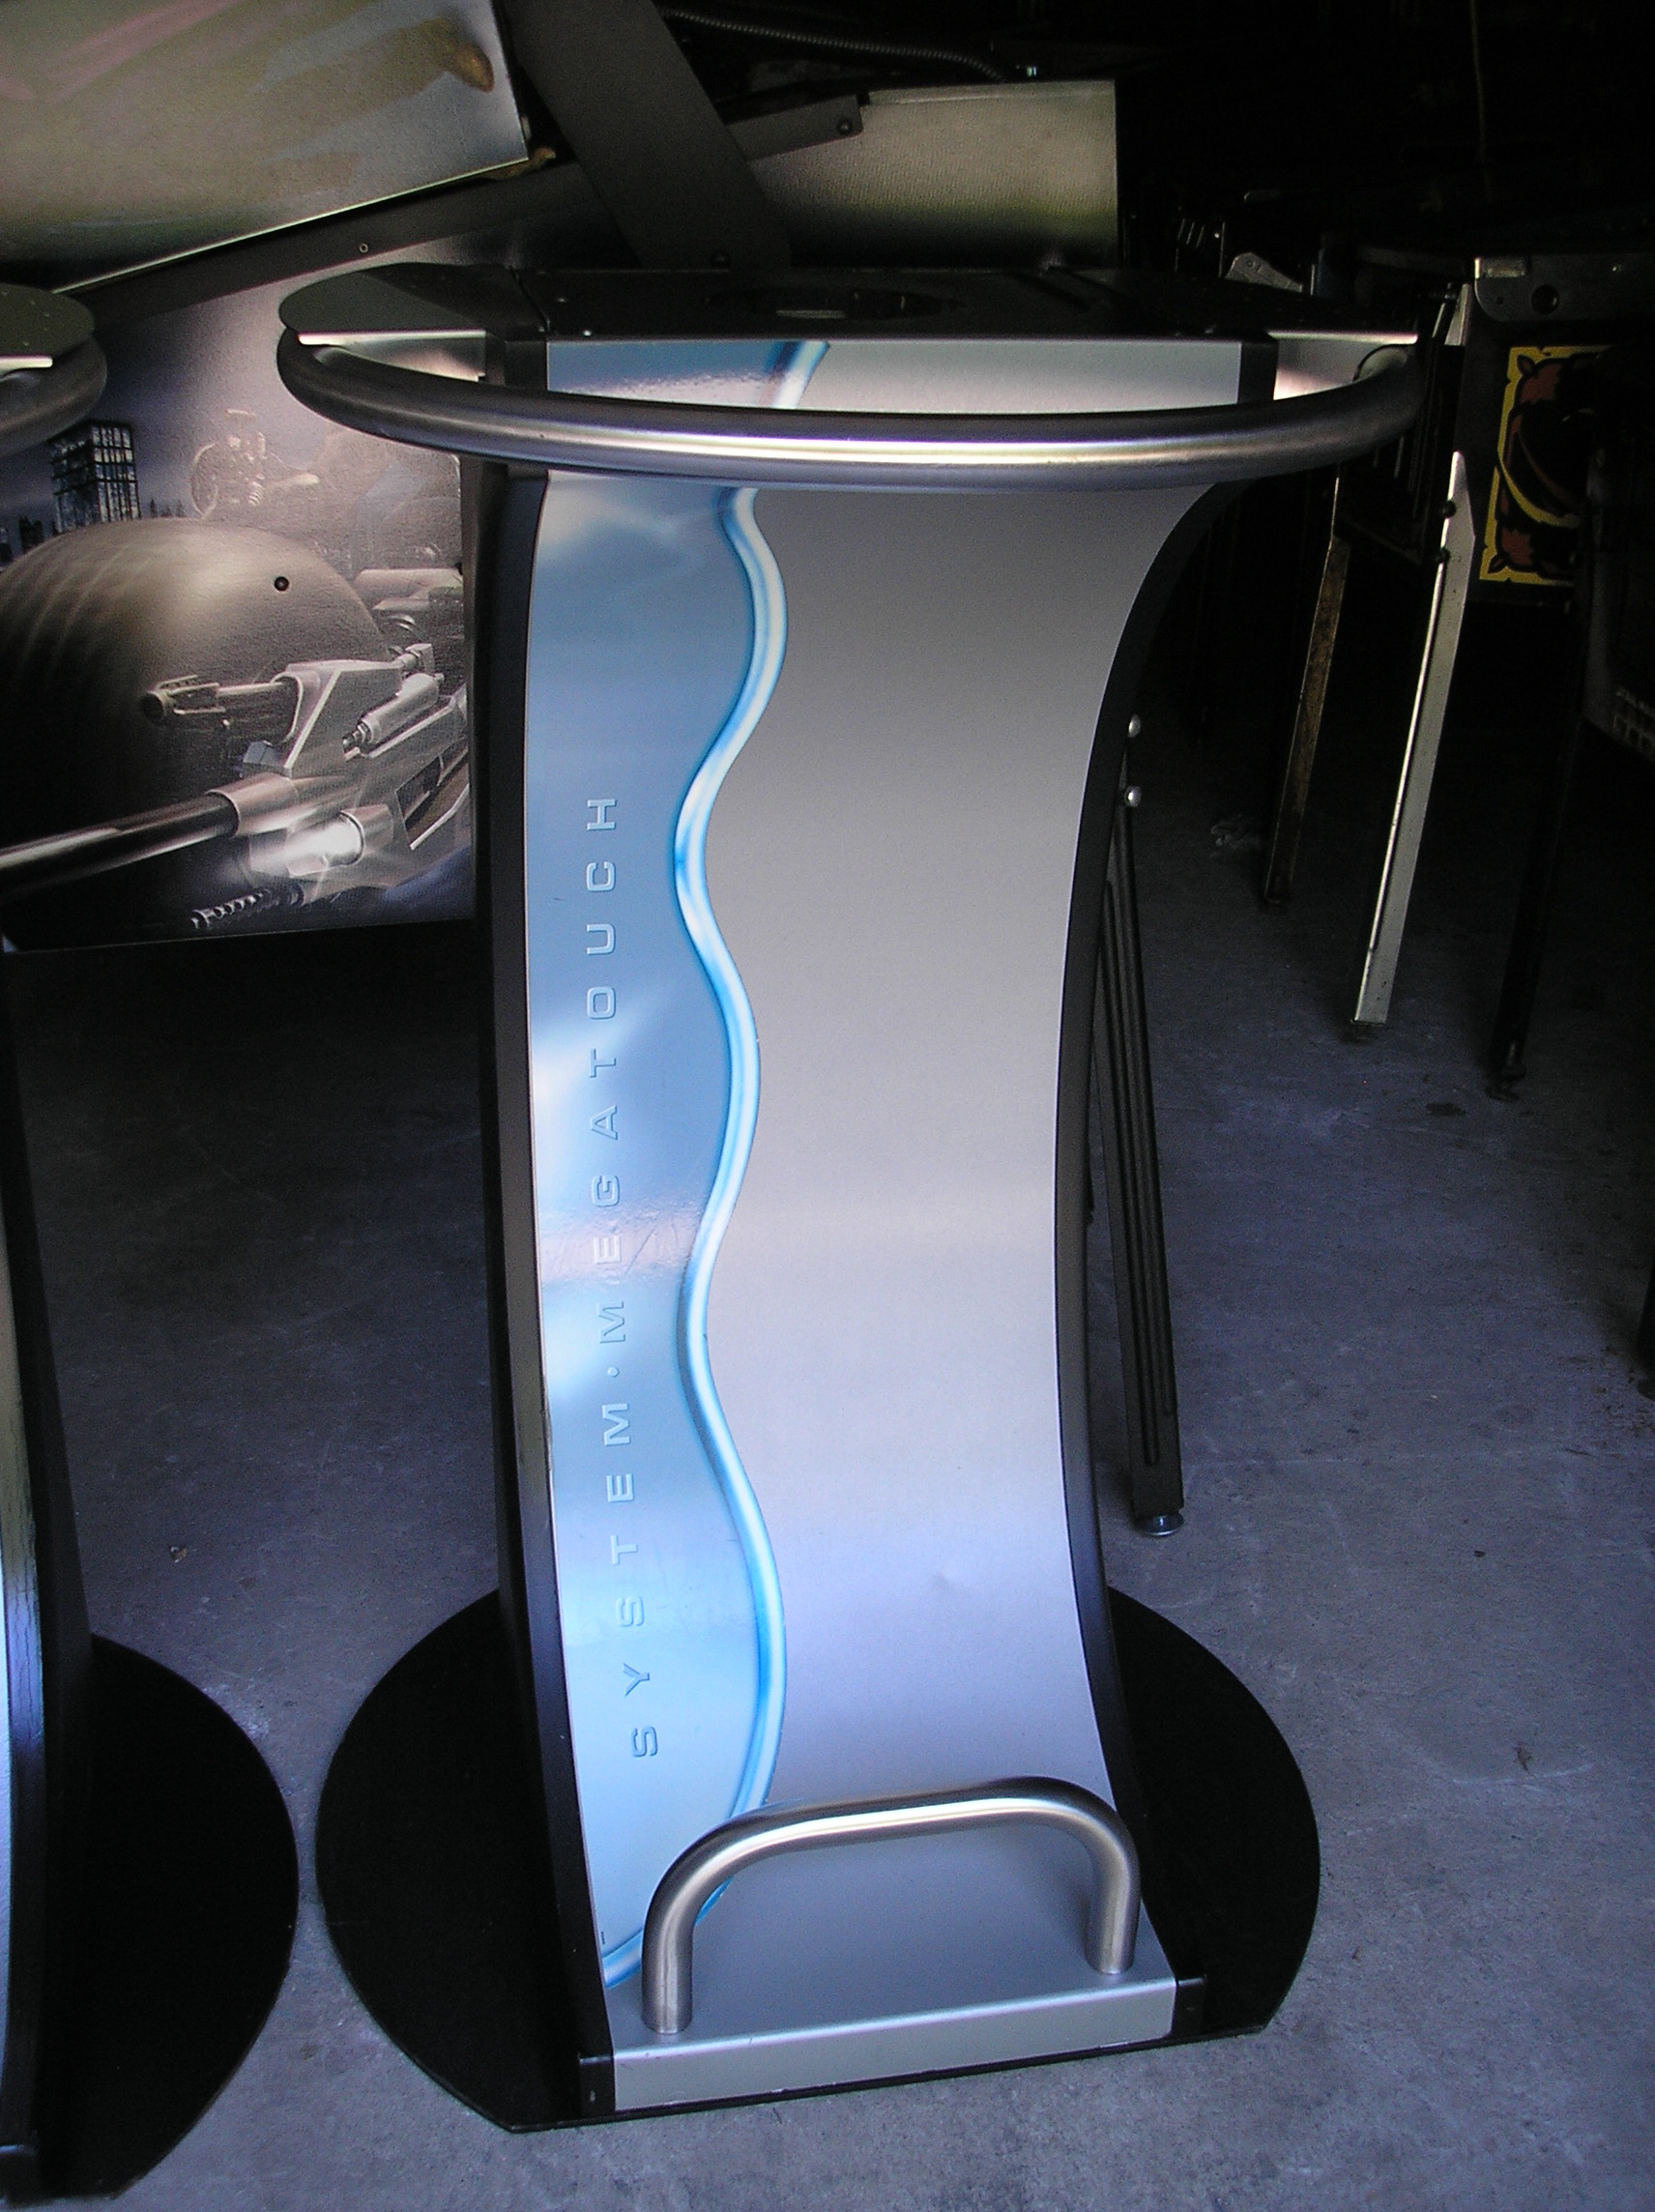 megatouch machine for sale